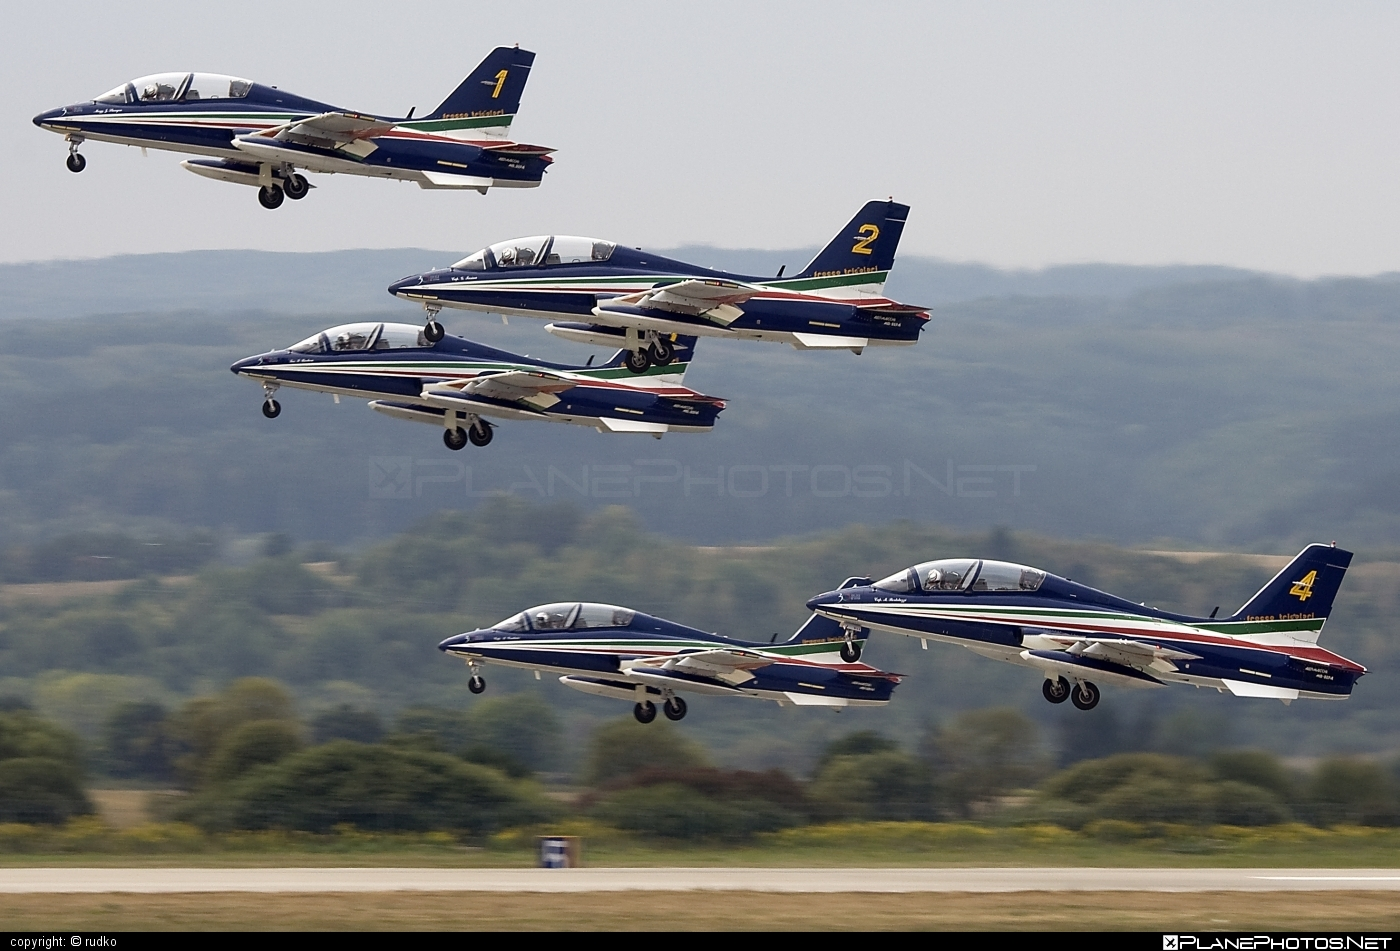 Aermacchi MB-339-A/PAN - MM54517 operated by Aeronautica Militare (Italian Air Force) #aermacchi #aermacchi339 #aermacchimb339 #aermacchimb339apan #mb339 #mb339apan